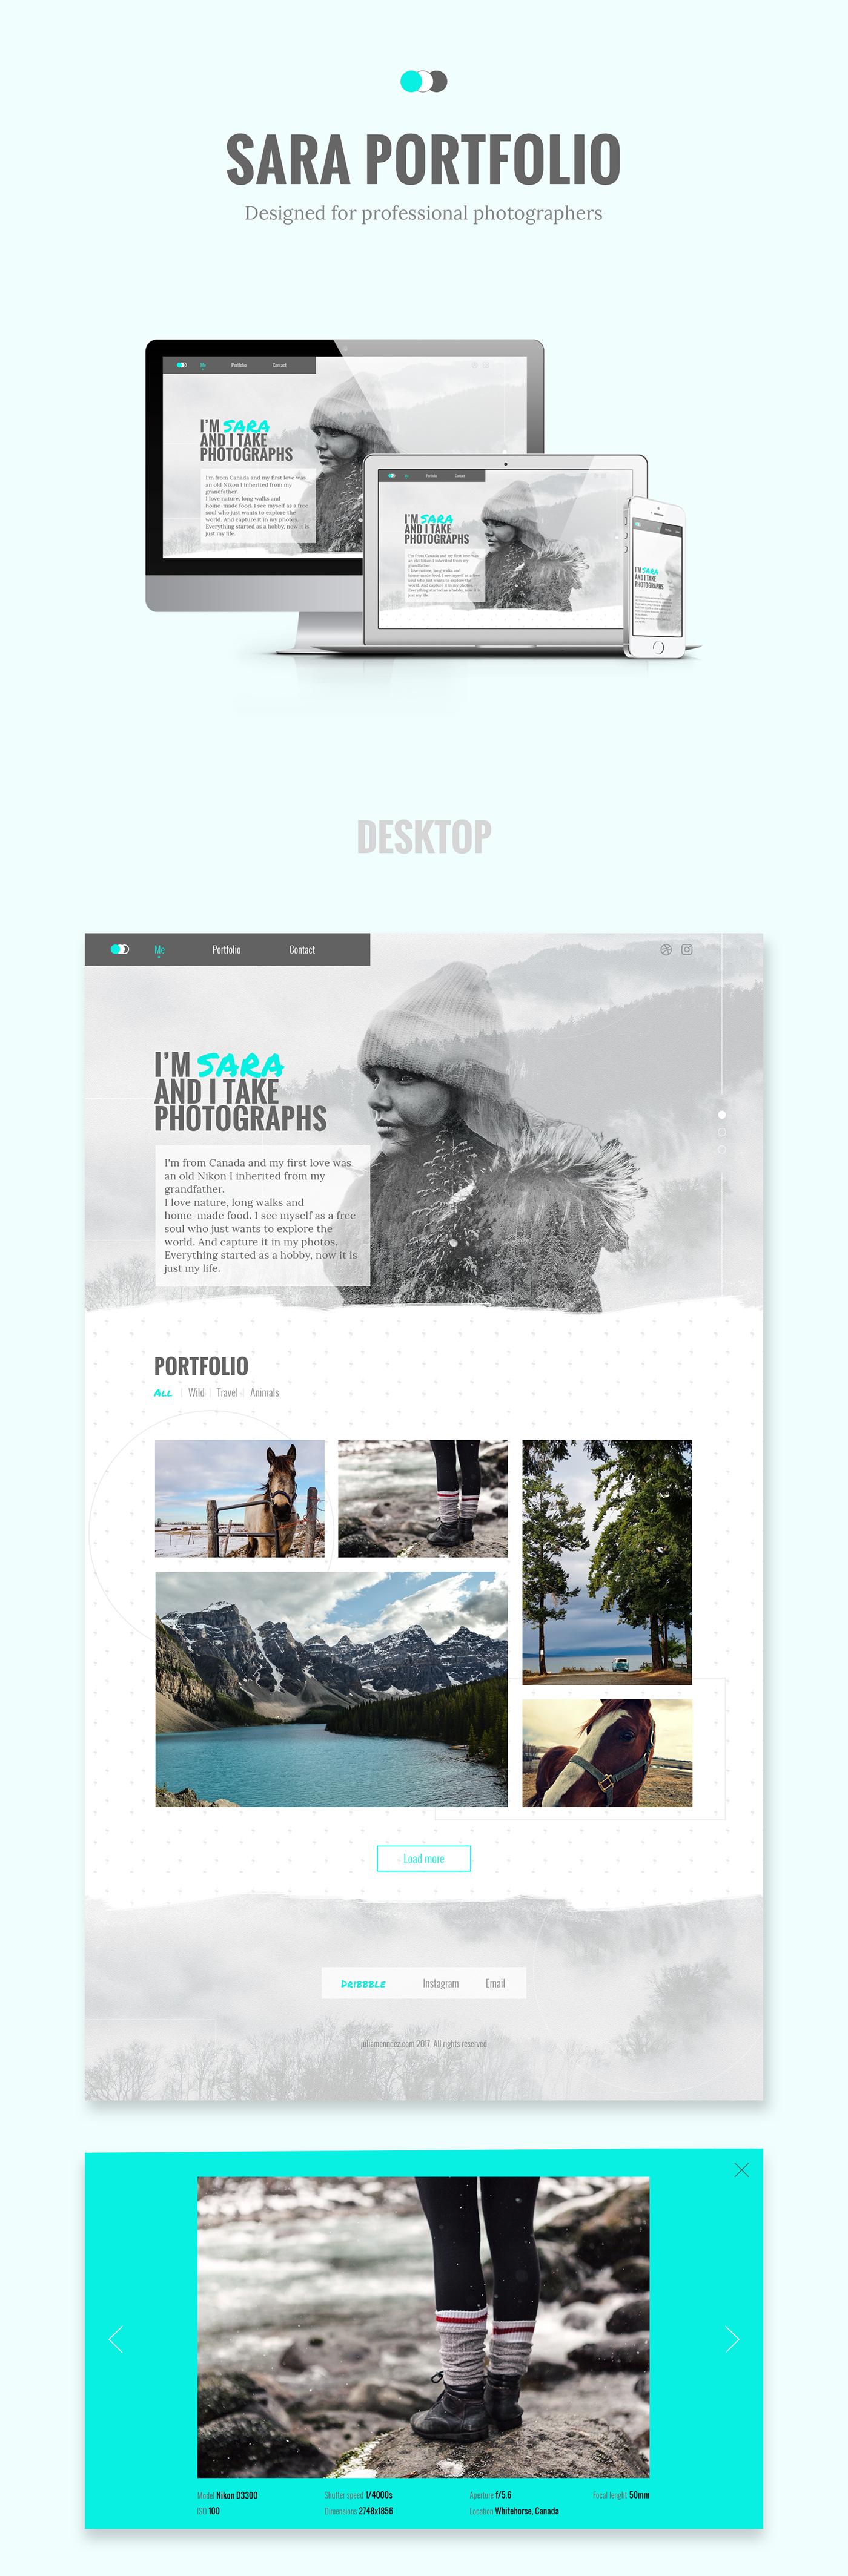 singe-page portfolio Photography  Web Design  template